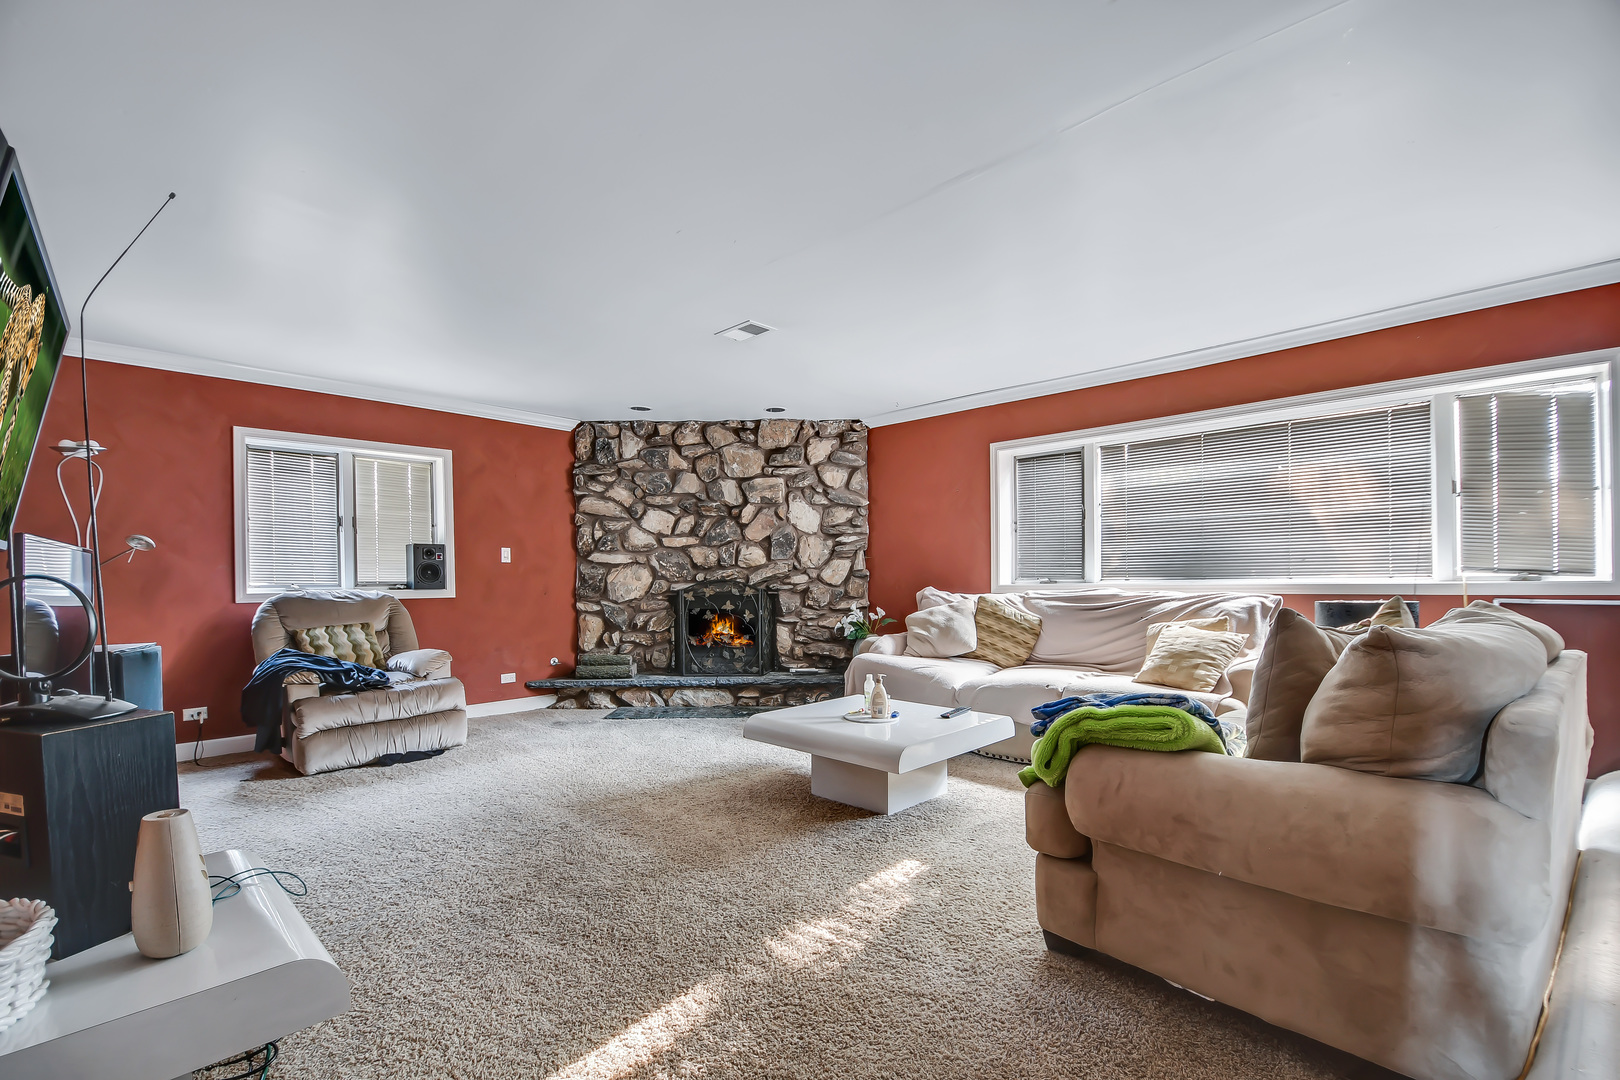 13558 South Monaghan, Homer Glen, Illinois, 60491